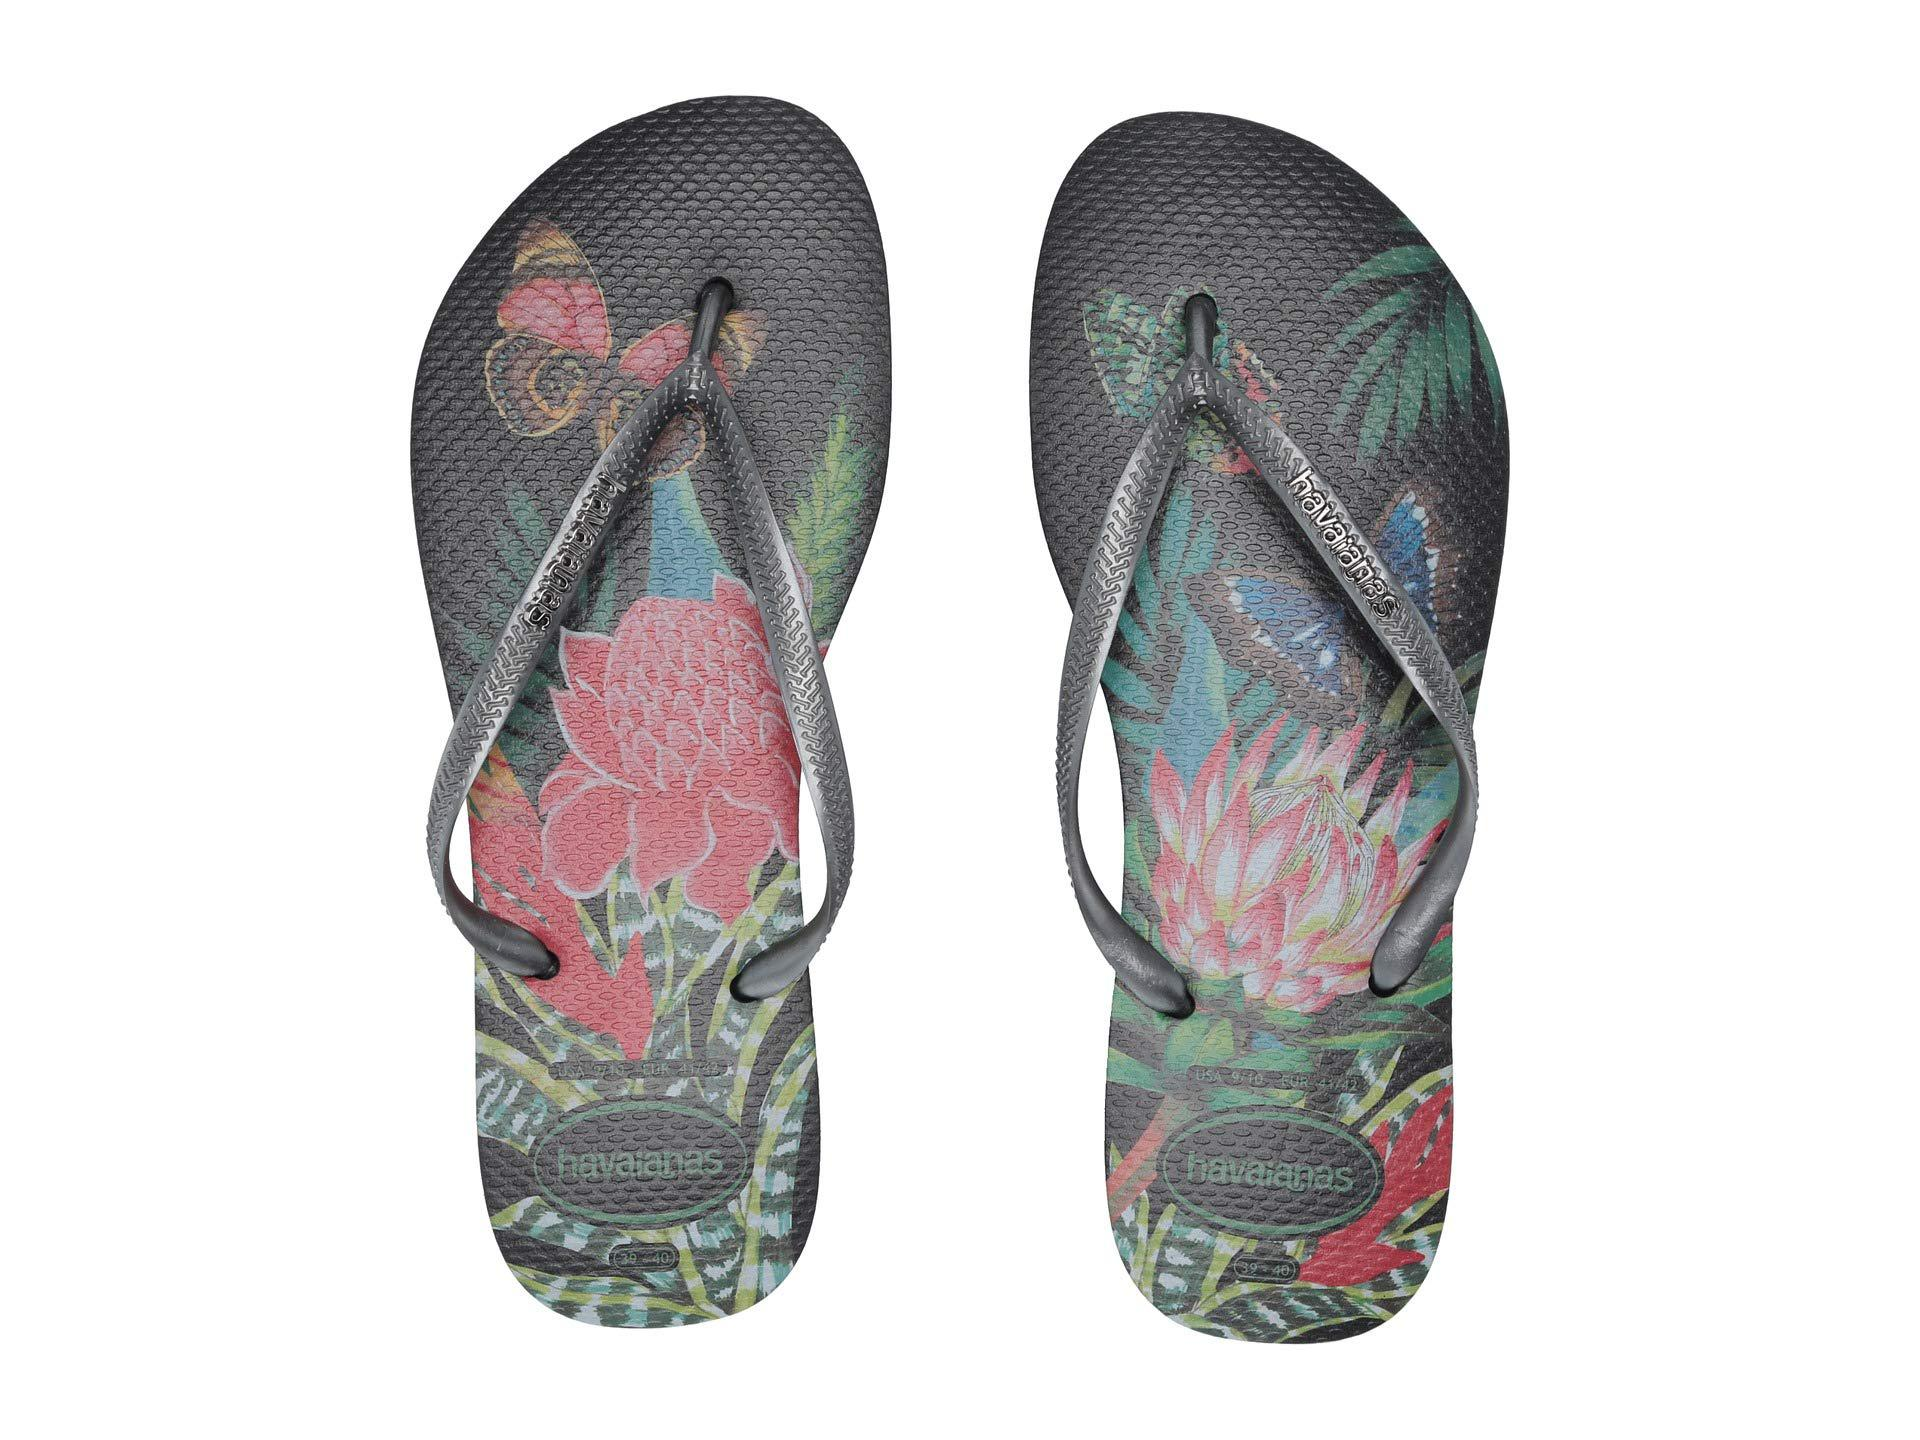 fe59d929d8ff21 Havaianas - Slim Tropical Flip Flops (black graphite) Women s Sandals -  Lyst. View fullscreen